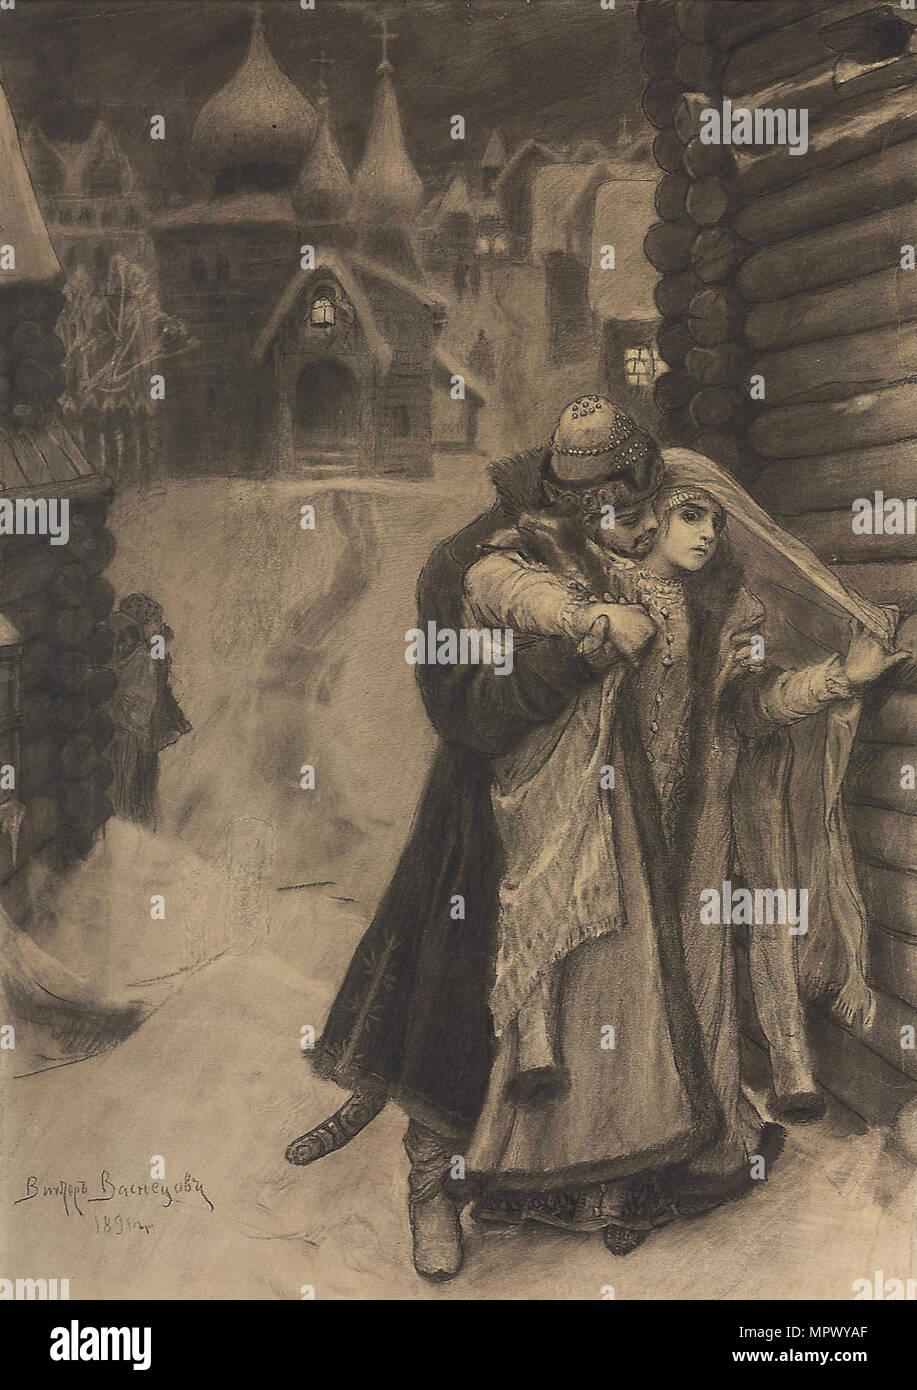 Illustration to the poem The Song of the Merchant Kalashnikov by M. Lermontov, 1891. - Stock Image